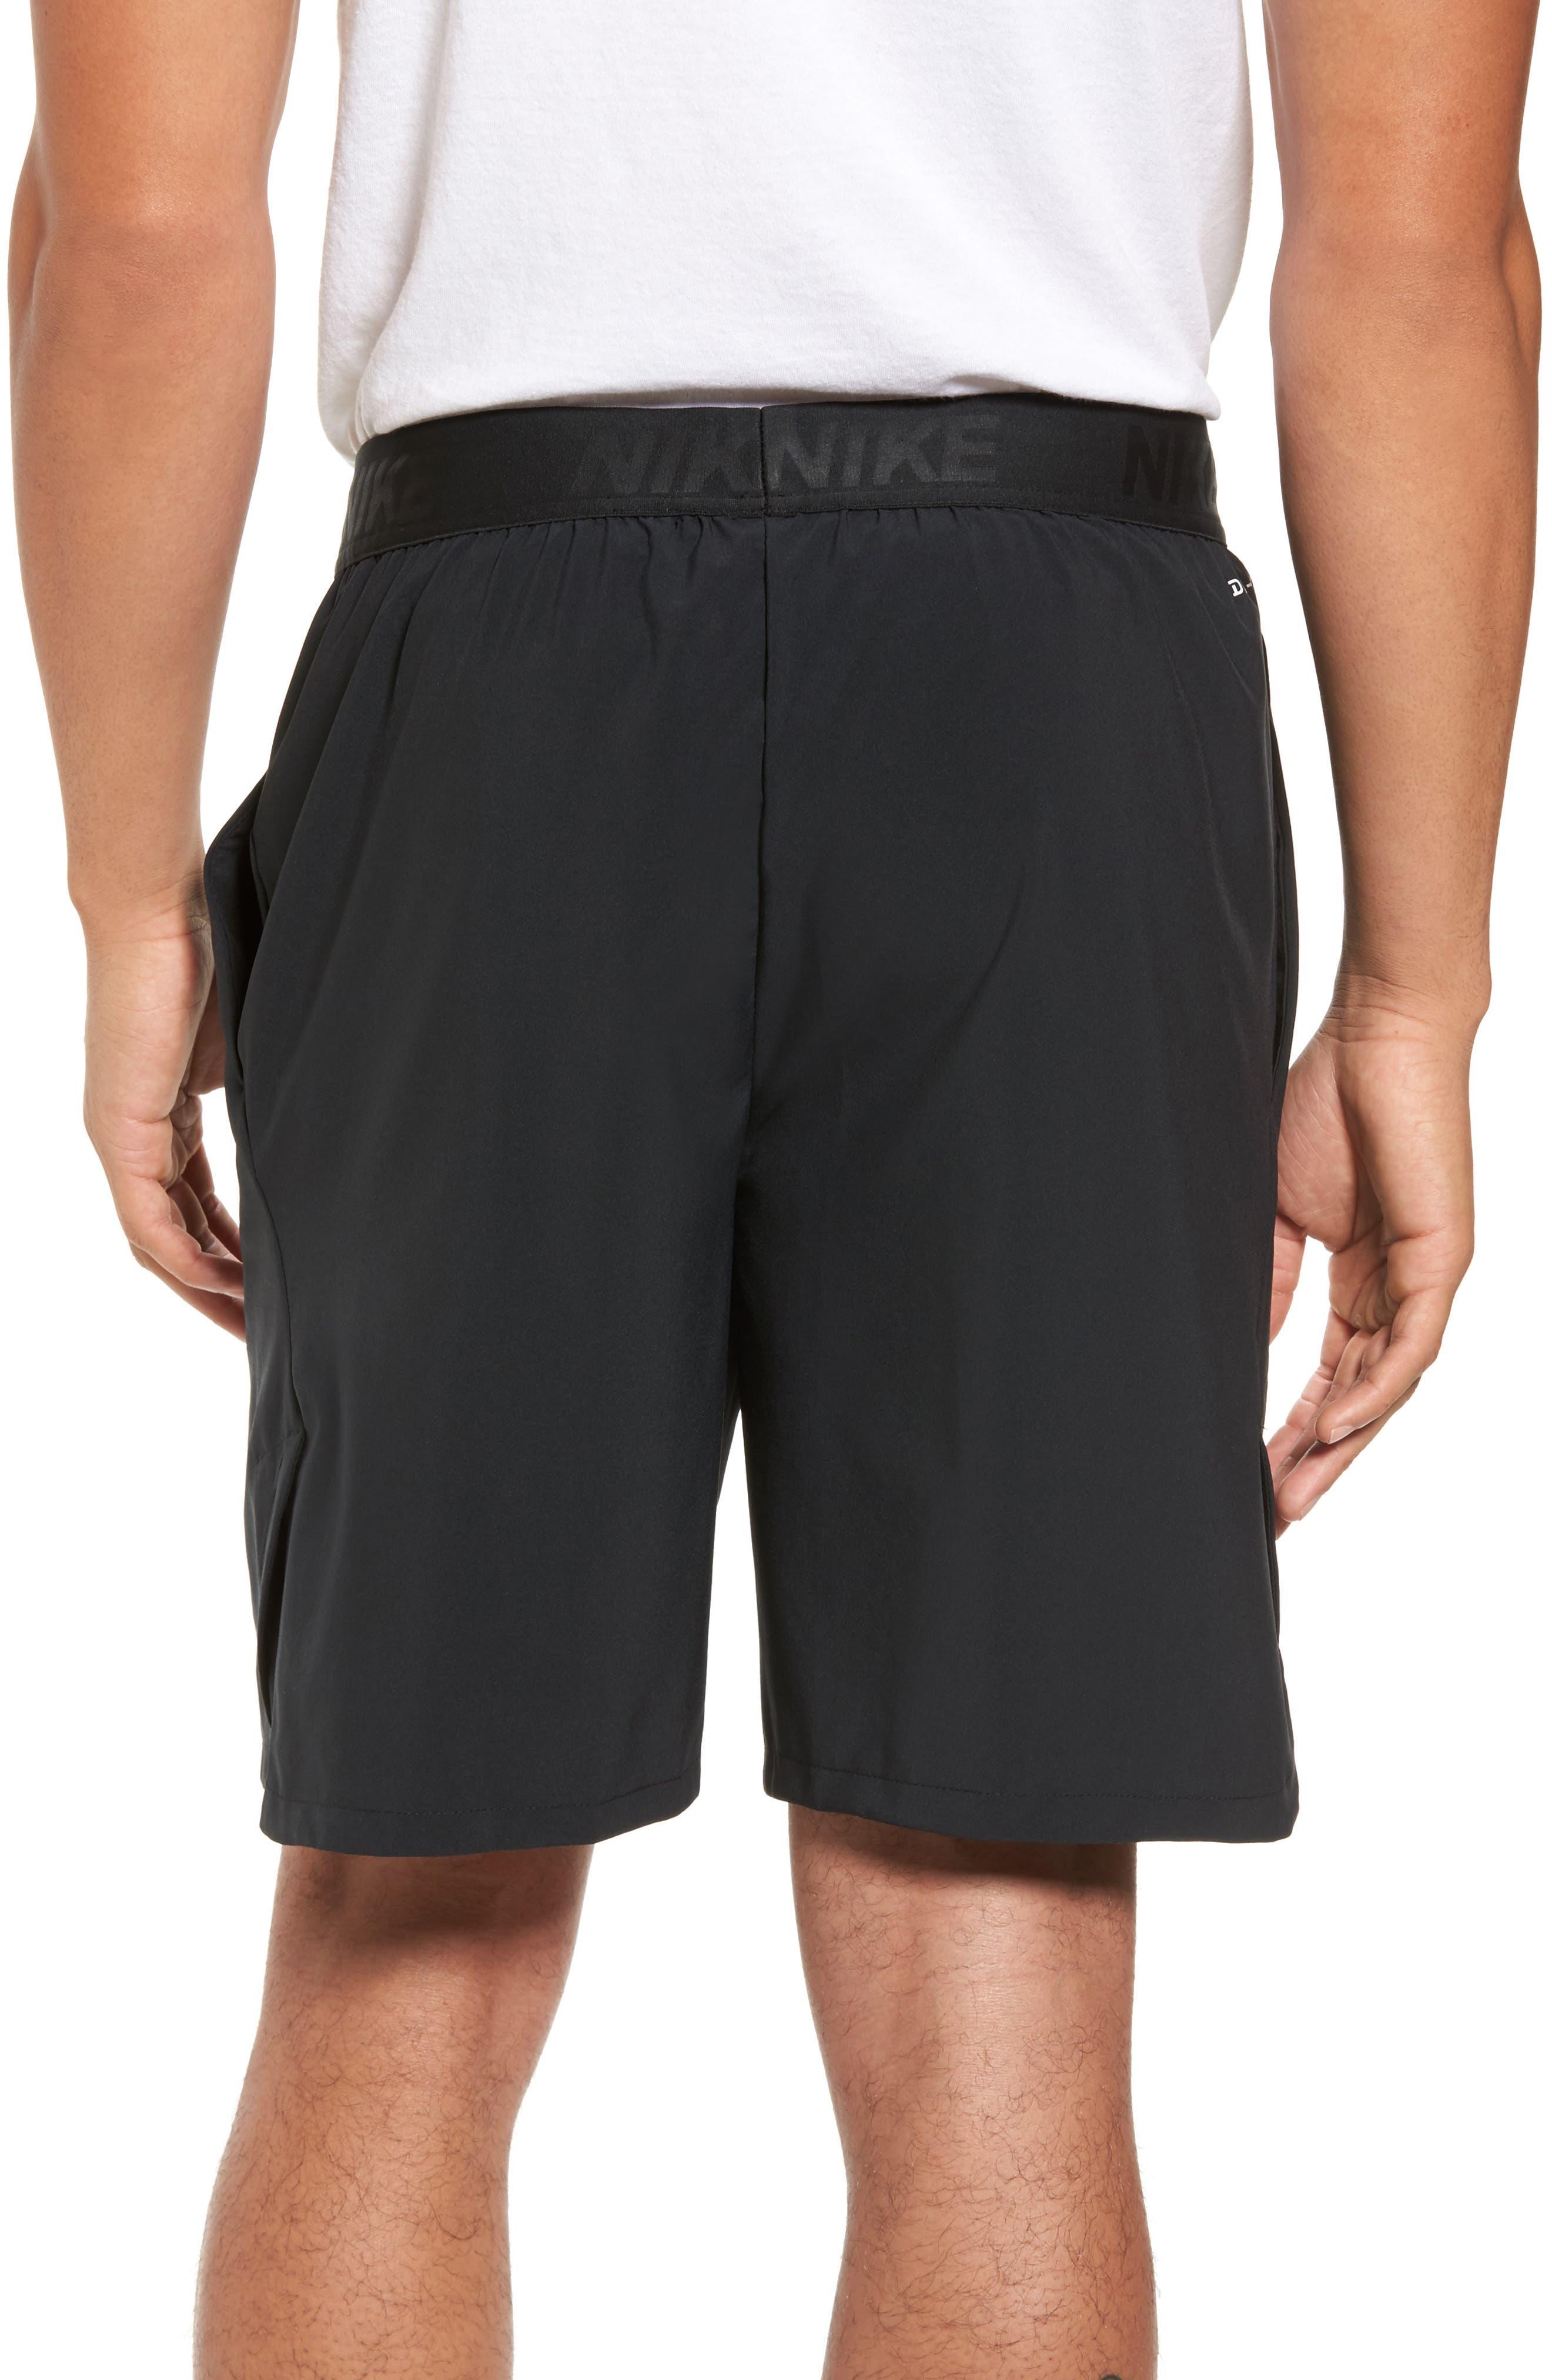 488162ae00d21 Nike Shorts for Men